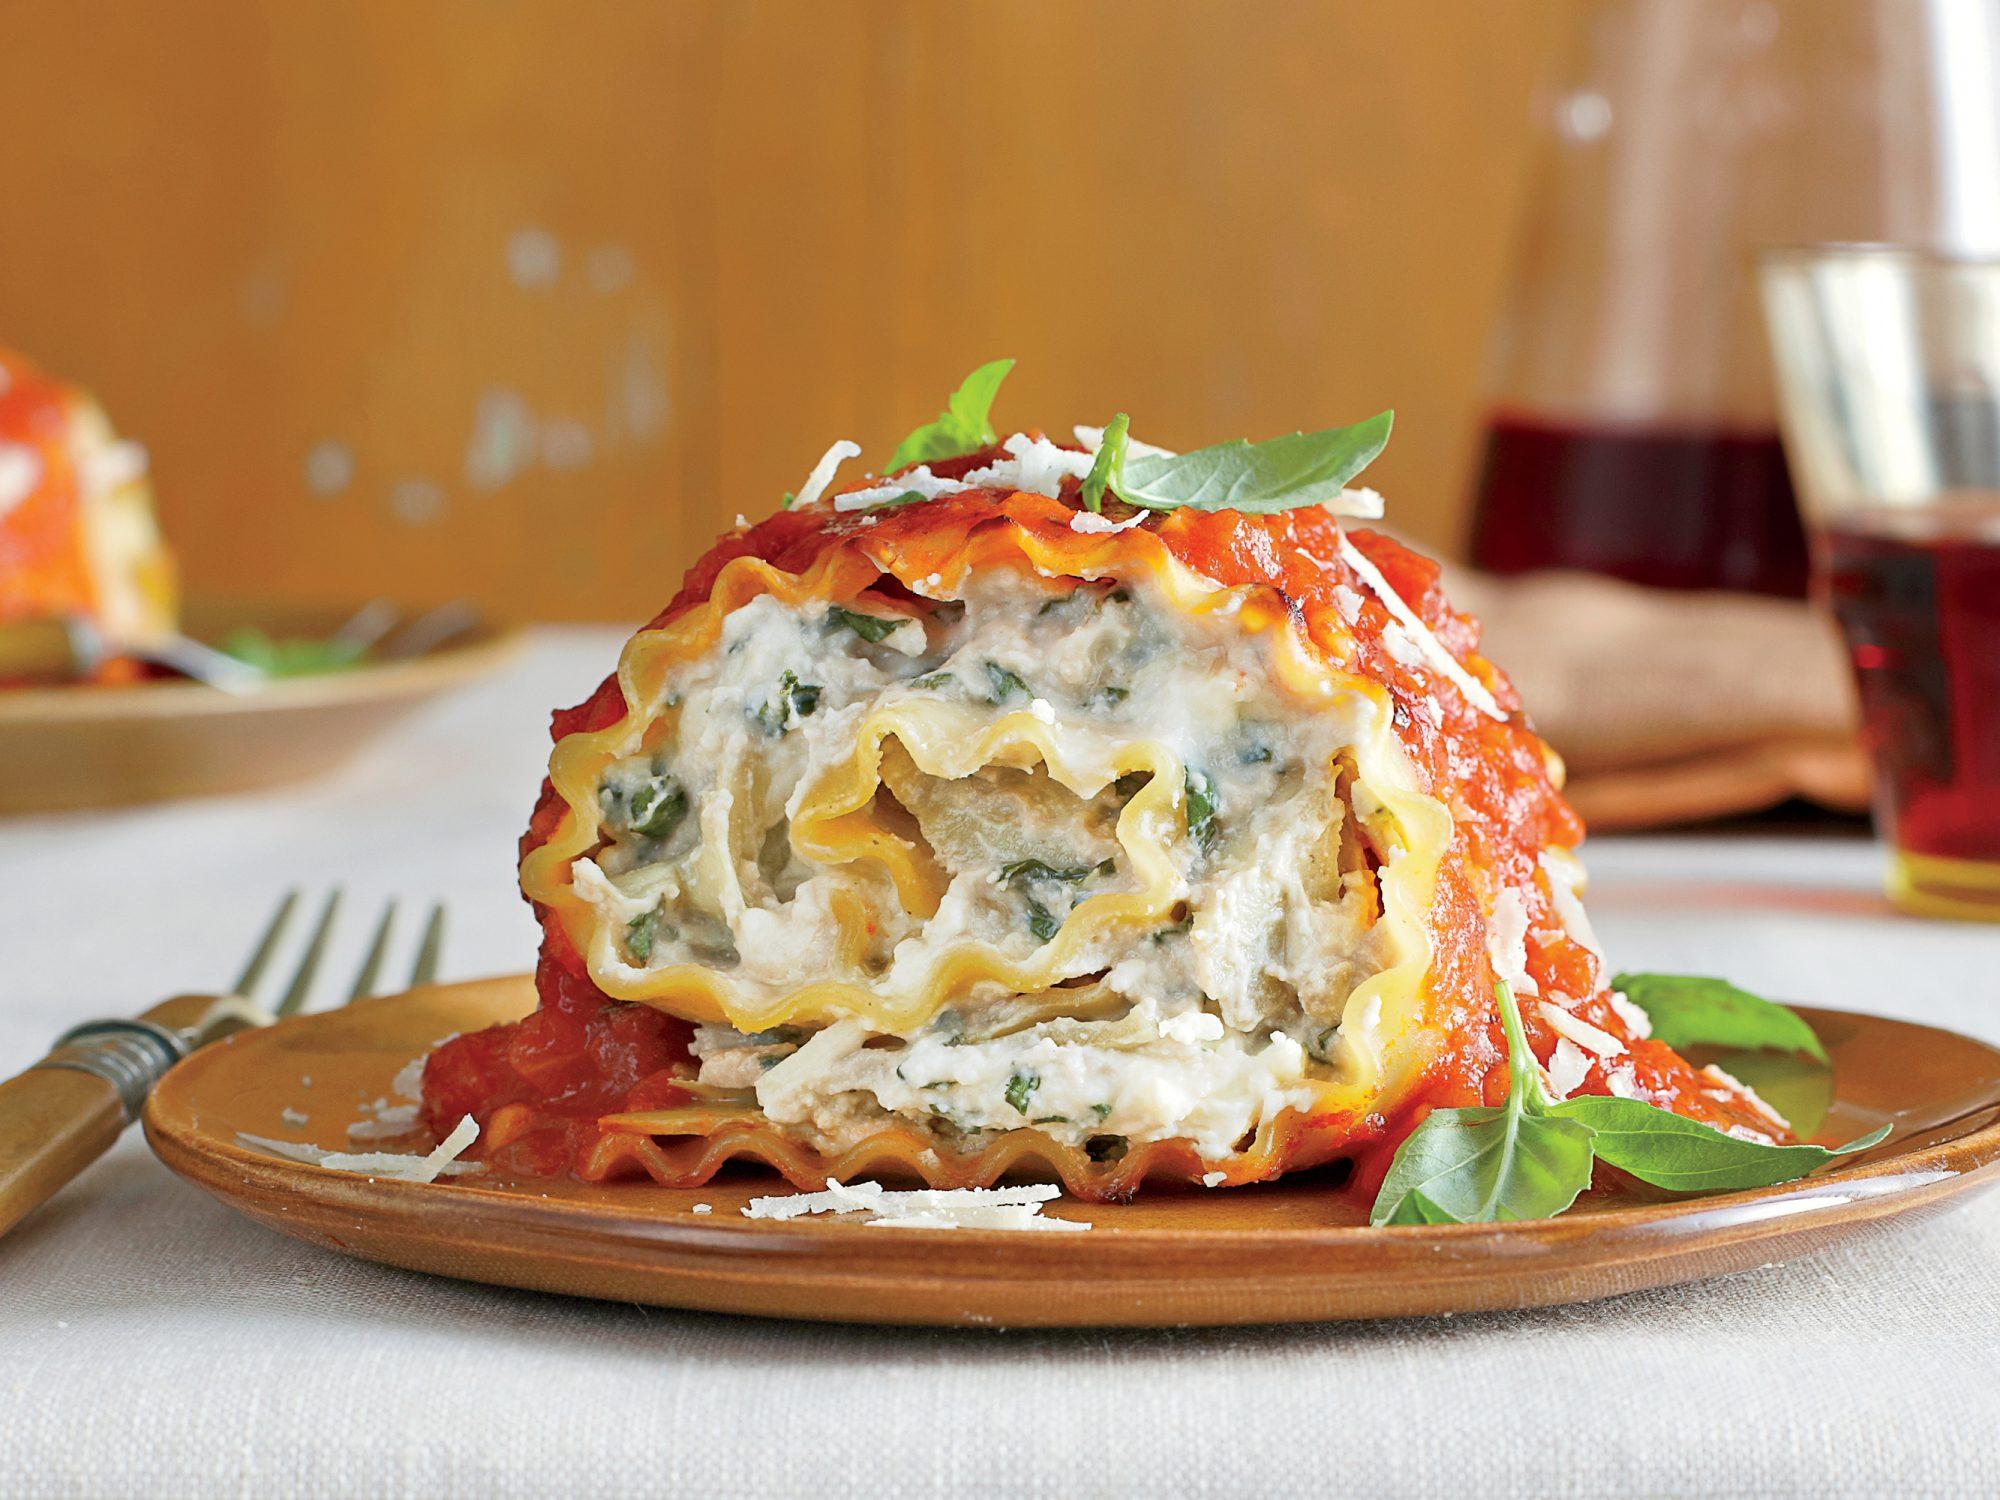 tomato-basil-lasagna-rolls-sl-crop.jpg